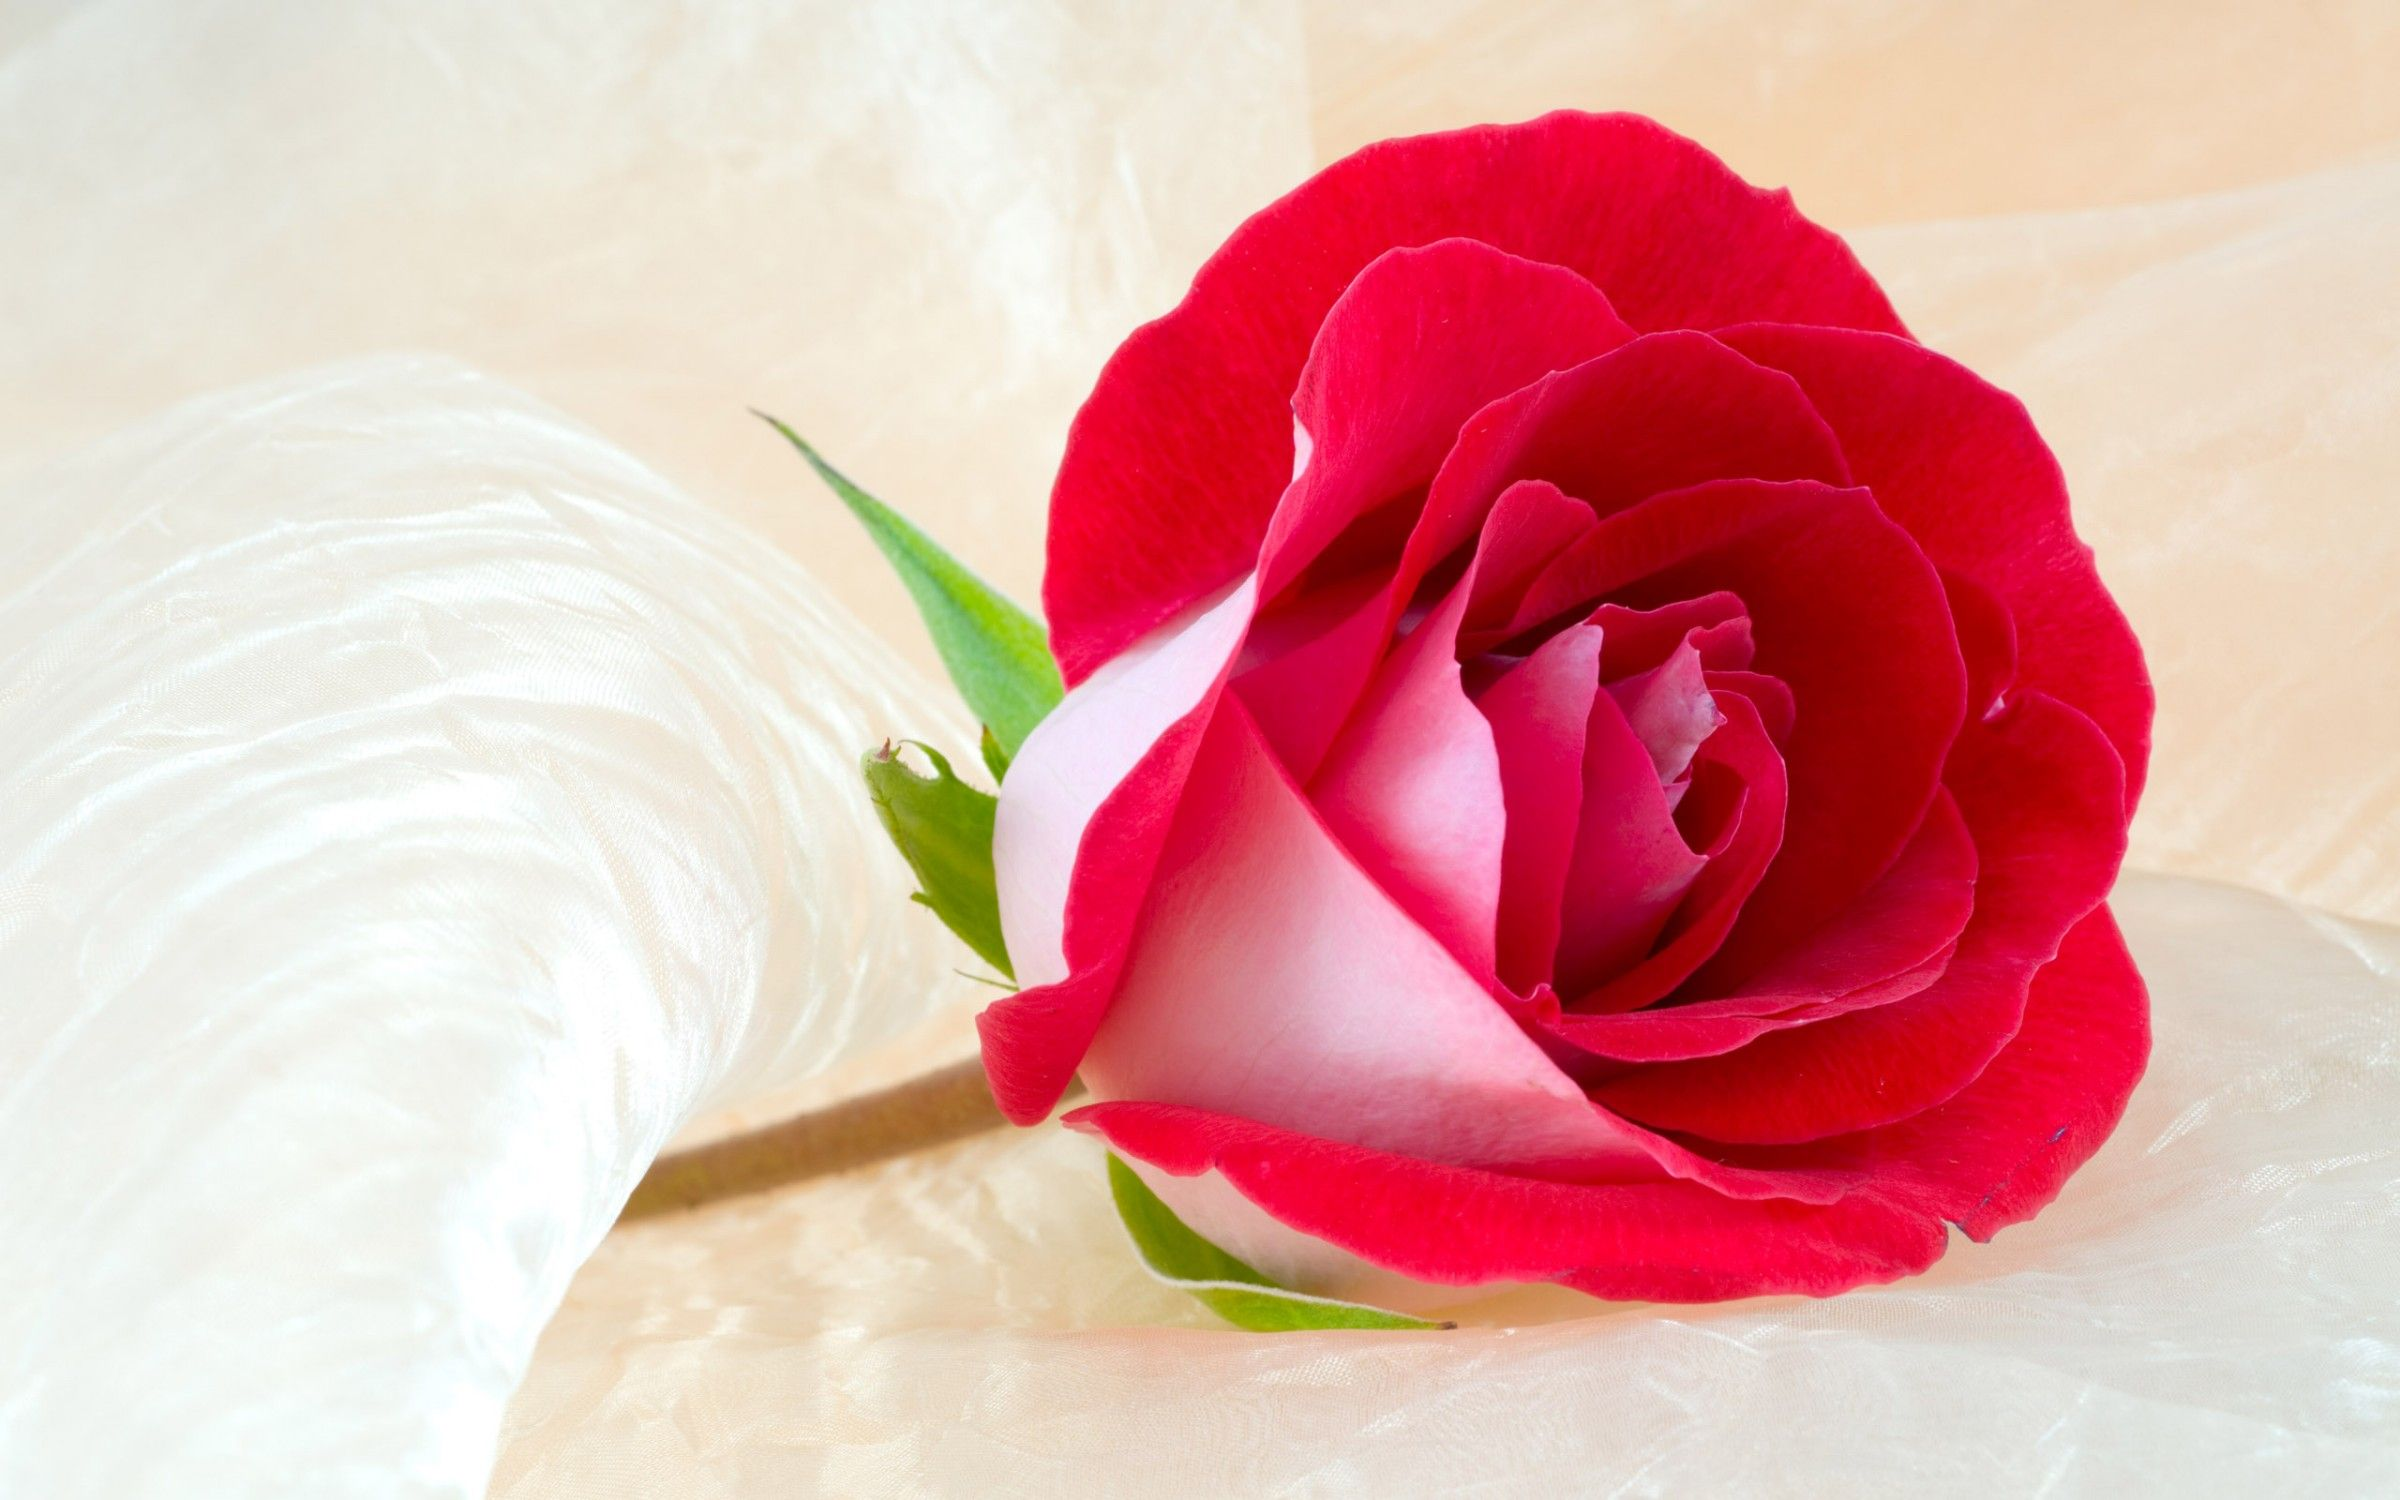 Beautiful Rose Hd Wallpapers Top Free Beautiful Rose Hd Backgrounds Wallpaperaccess